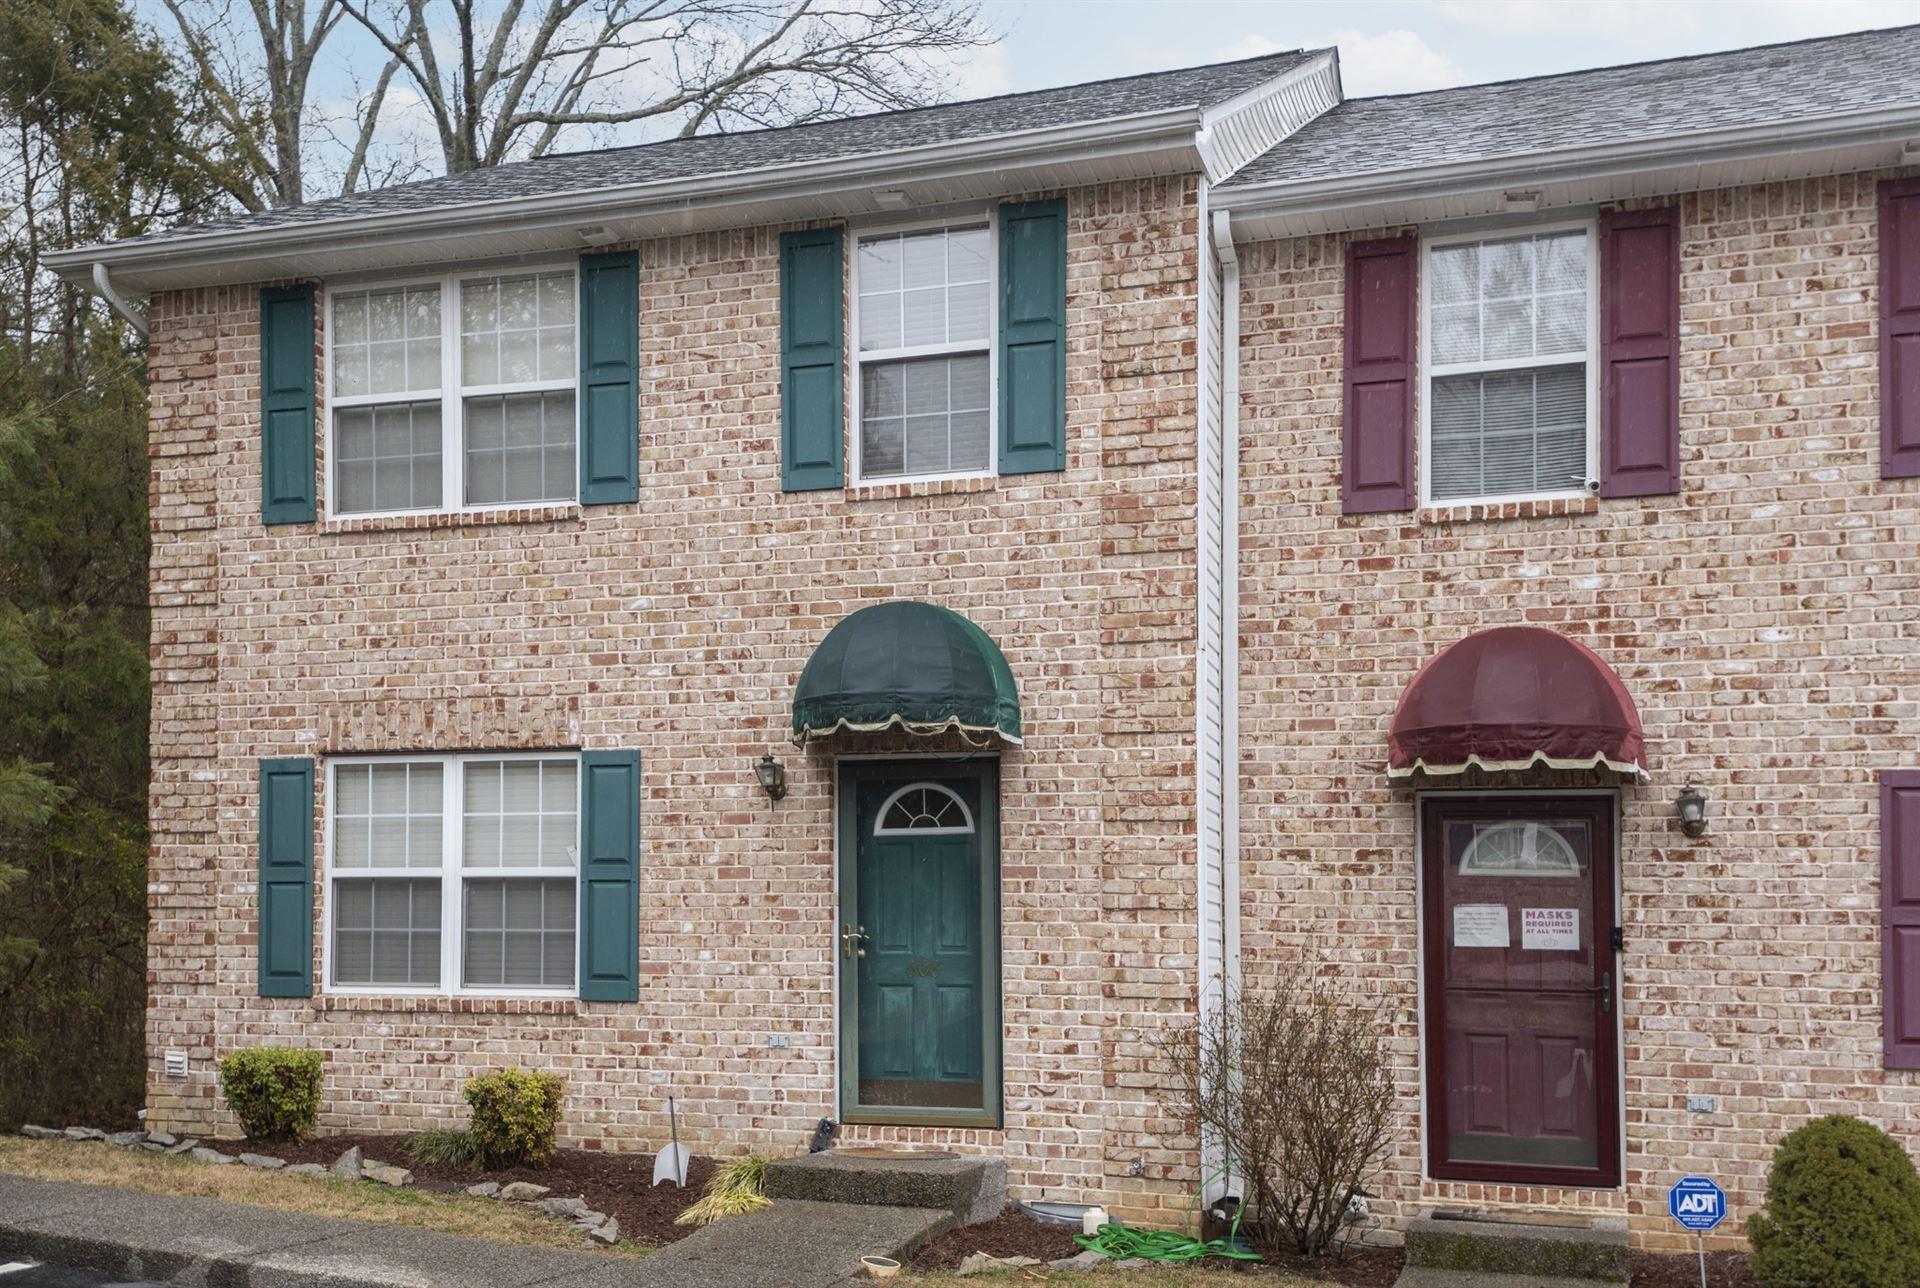 5170 Hickory Hollow Pkwy #608, Antioch, TN 37013 - MLS#: 2232645